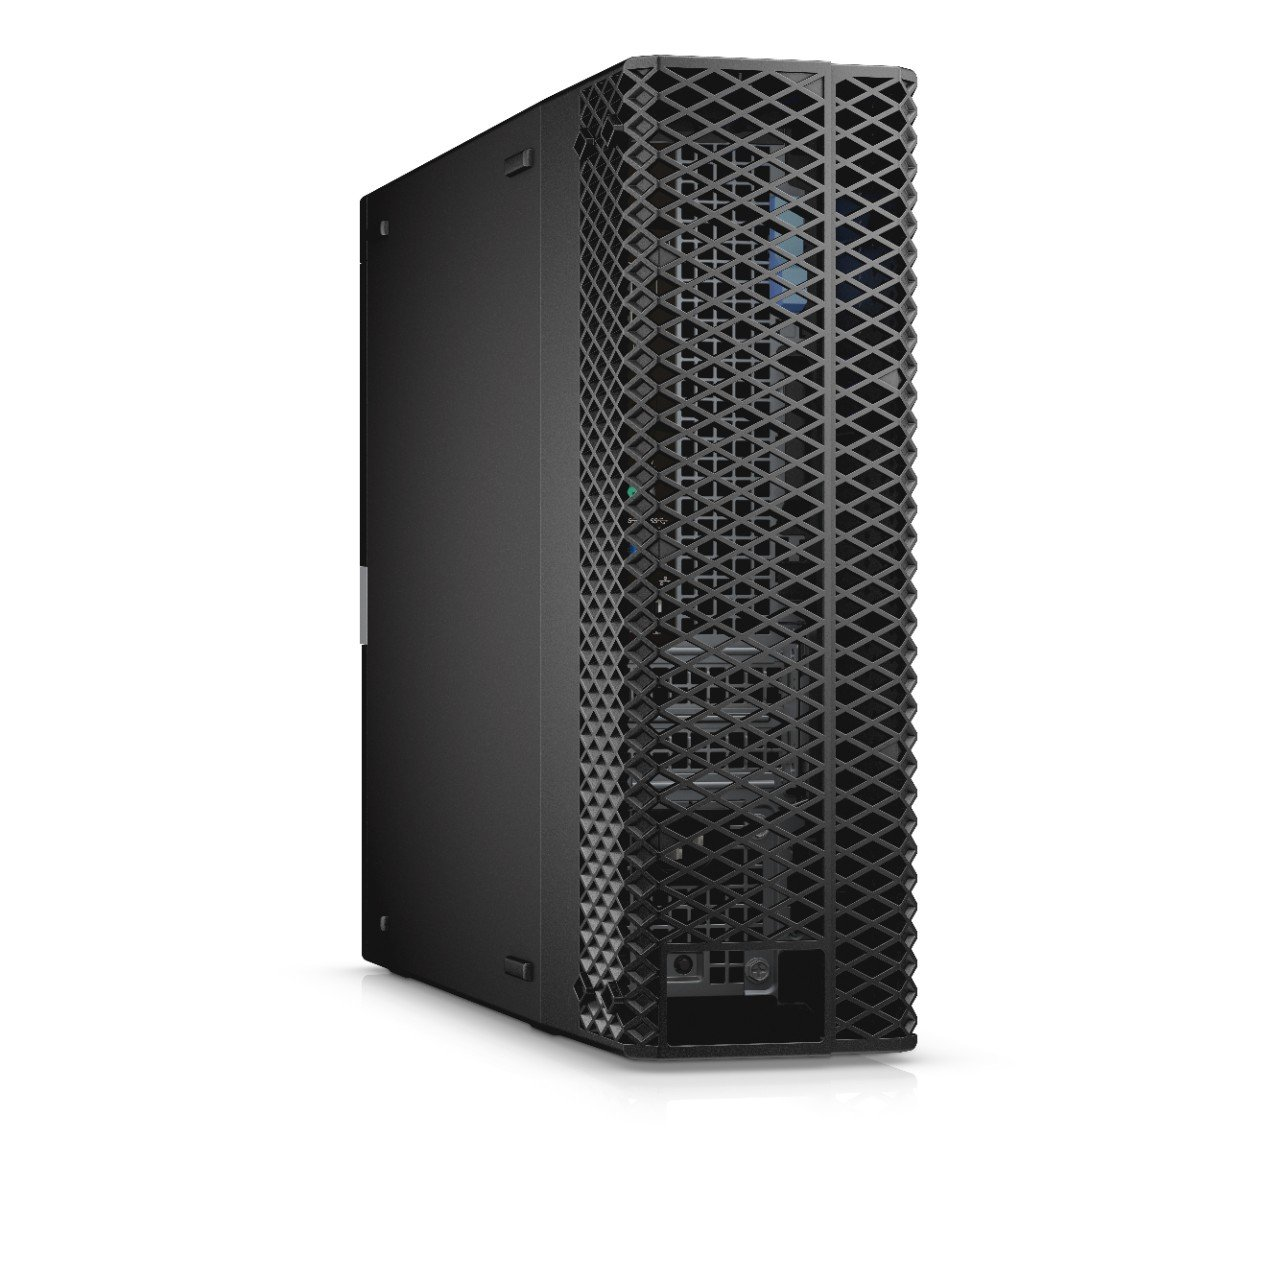 Dell H60K4 OptiPlex 5050 Small Form Factor Desktop, Intel Core i5-7500, 8GB RAM, 500GB HDD, Black by Dell (Image #4)